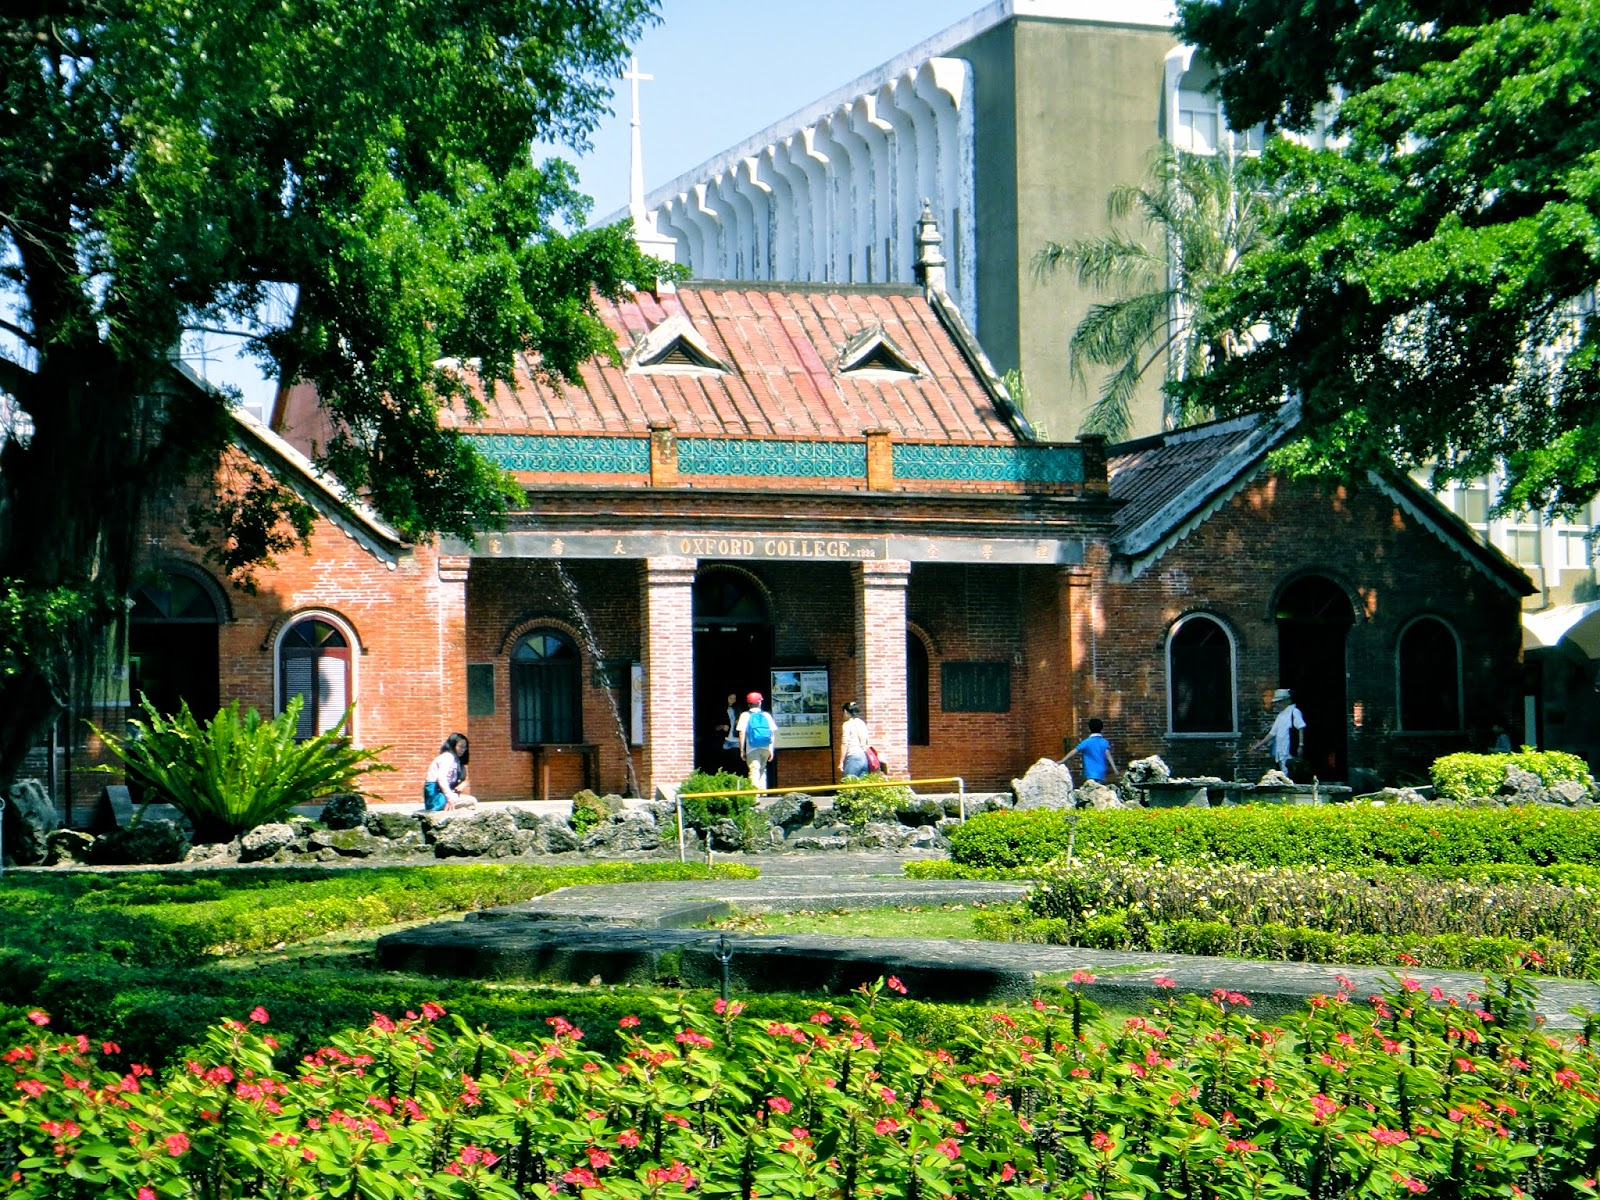 Aletheia University Yard Tamsui Taiwan